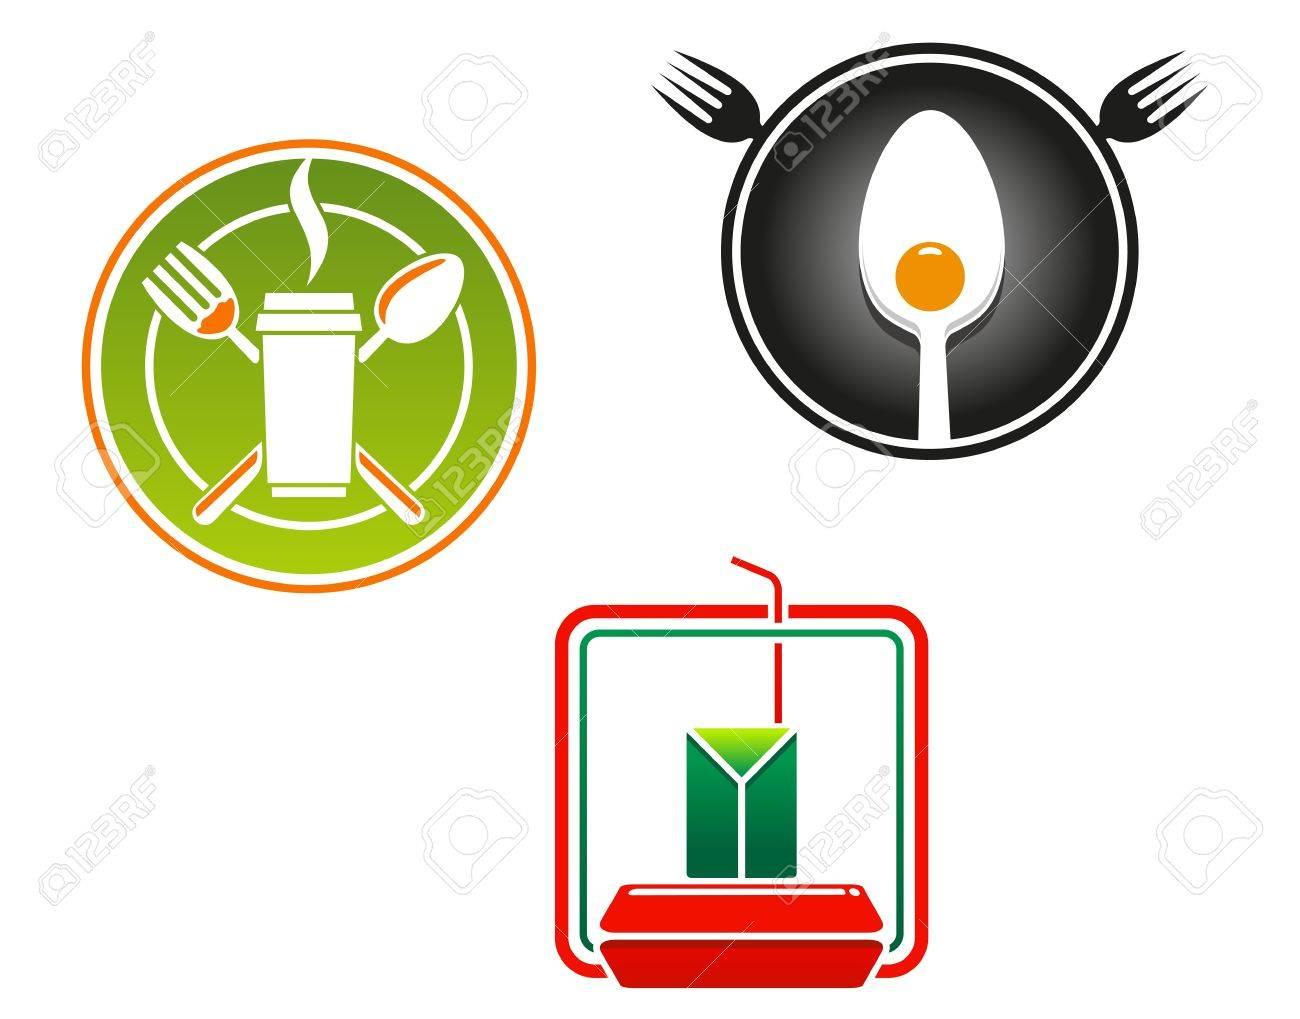 Fast food emblems and symbols for restaurant or junk food concept design Stock Vector - 20721557